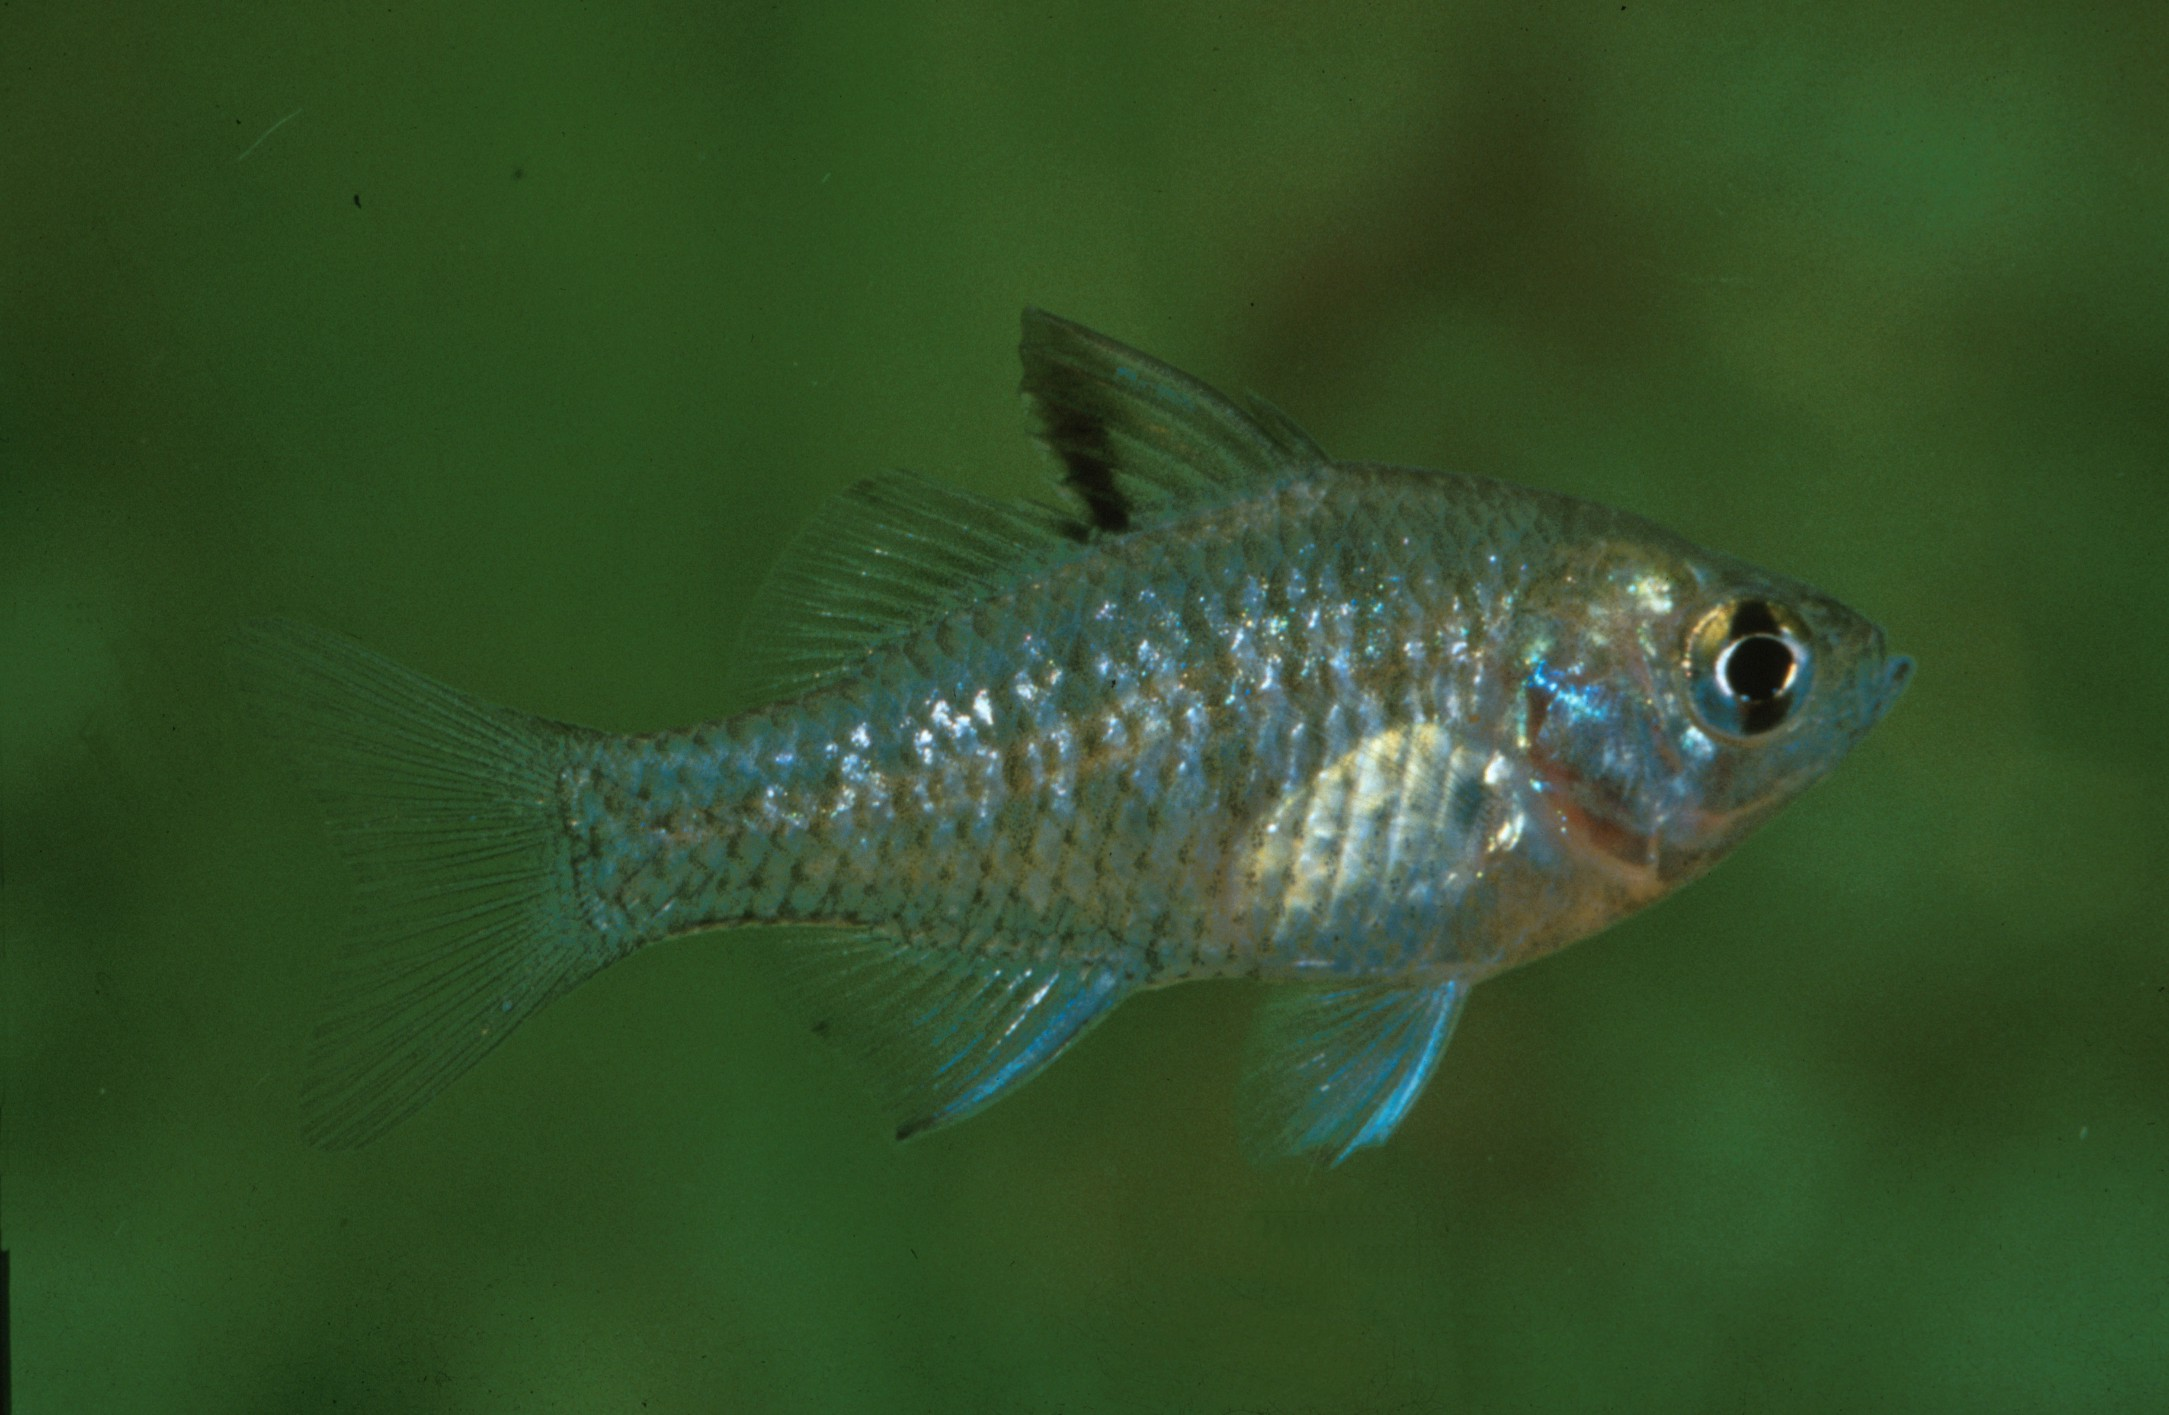 Denariusa bandata (Penny Fish)